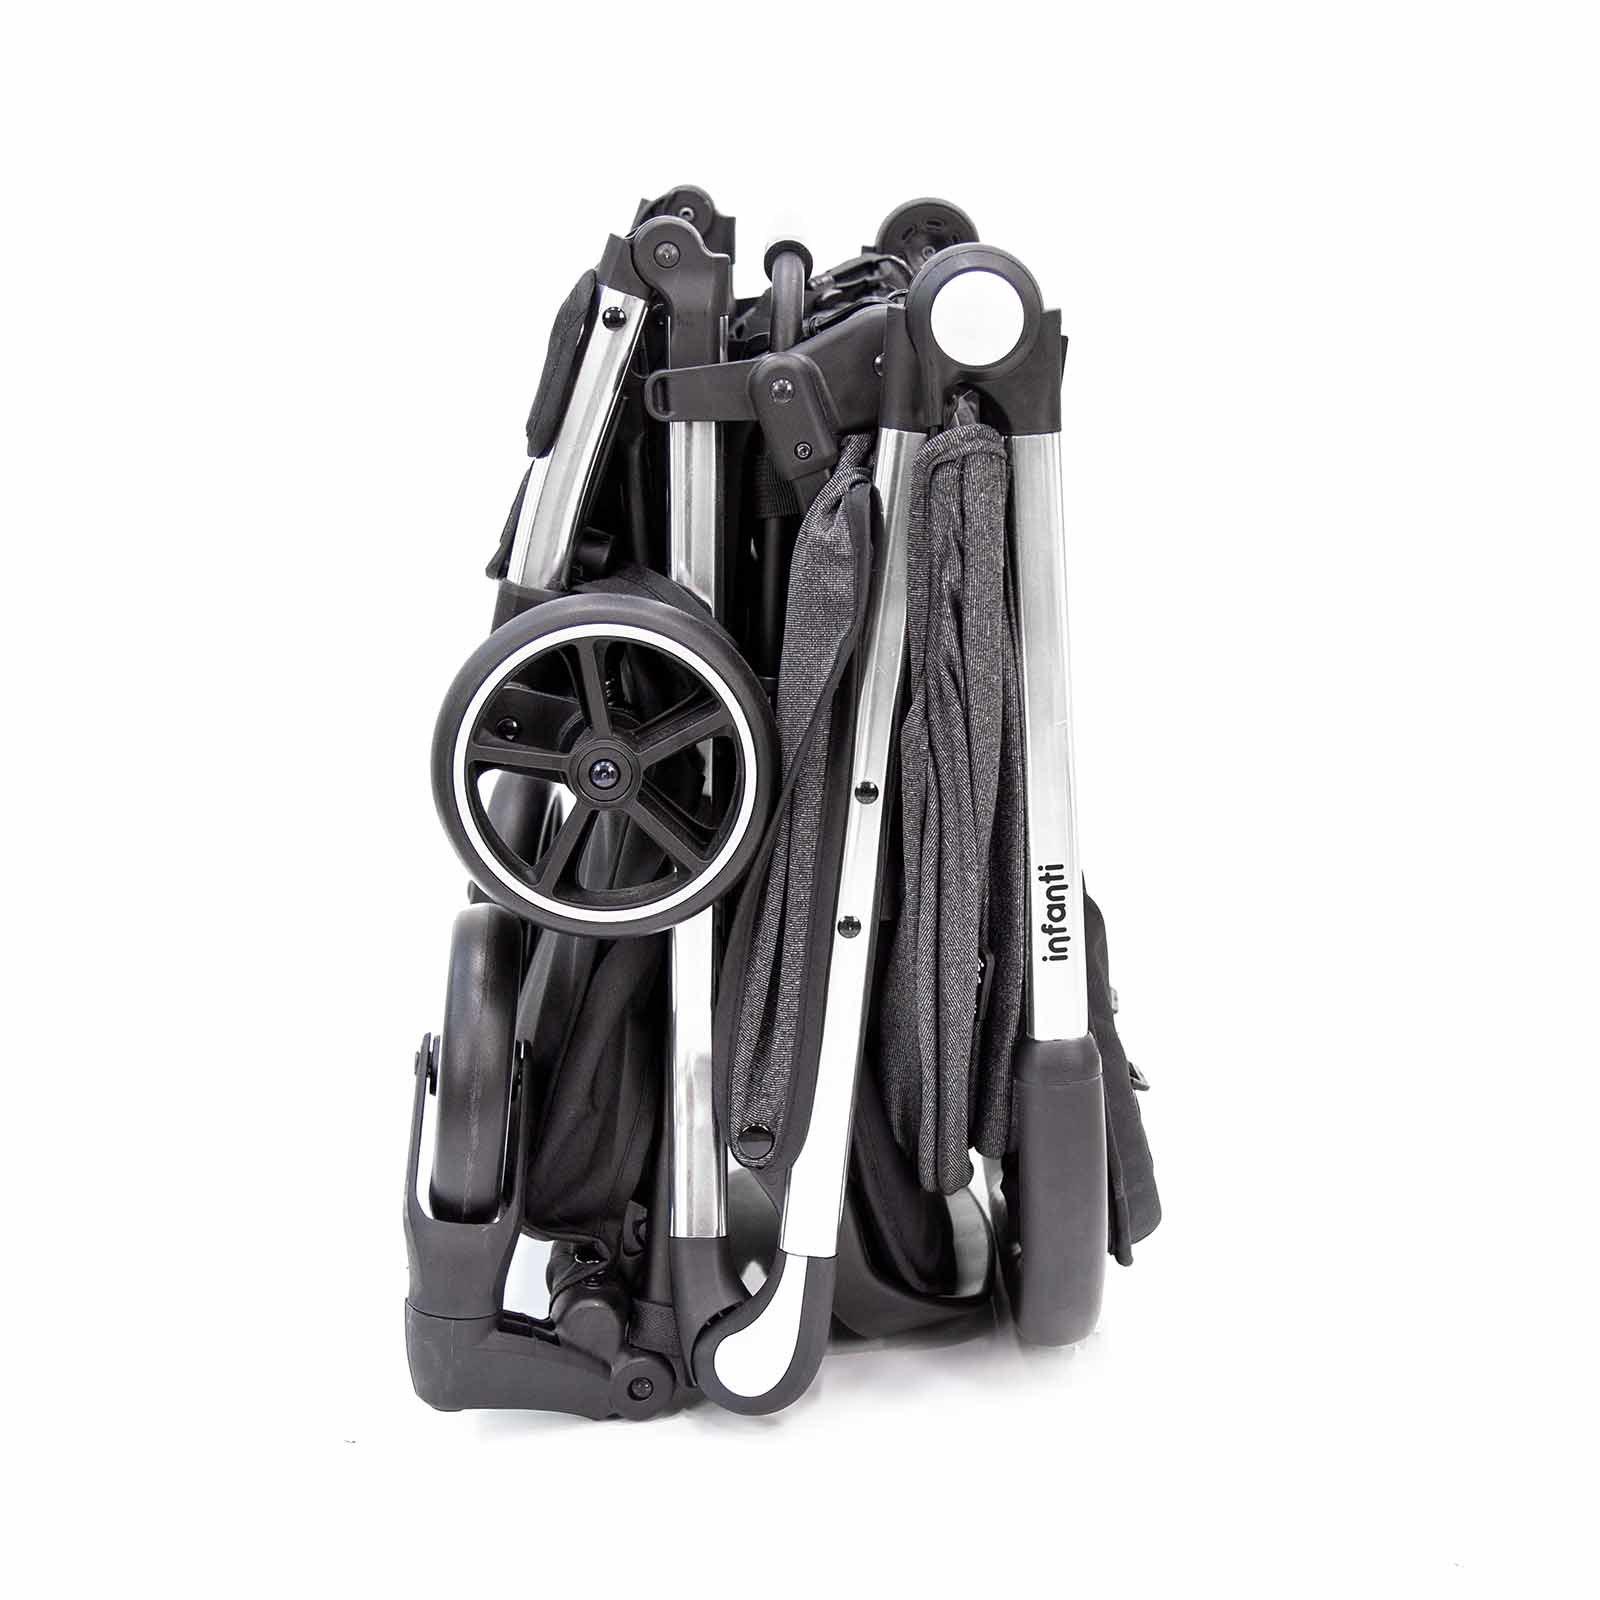 Carro Infanti Legend Duo Travel System Black Bold